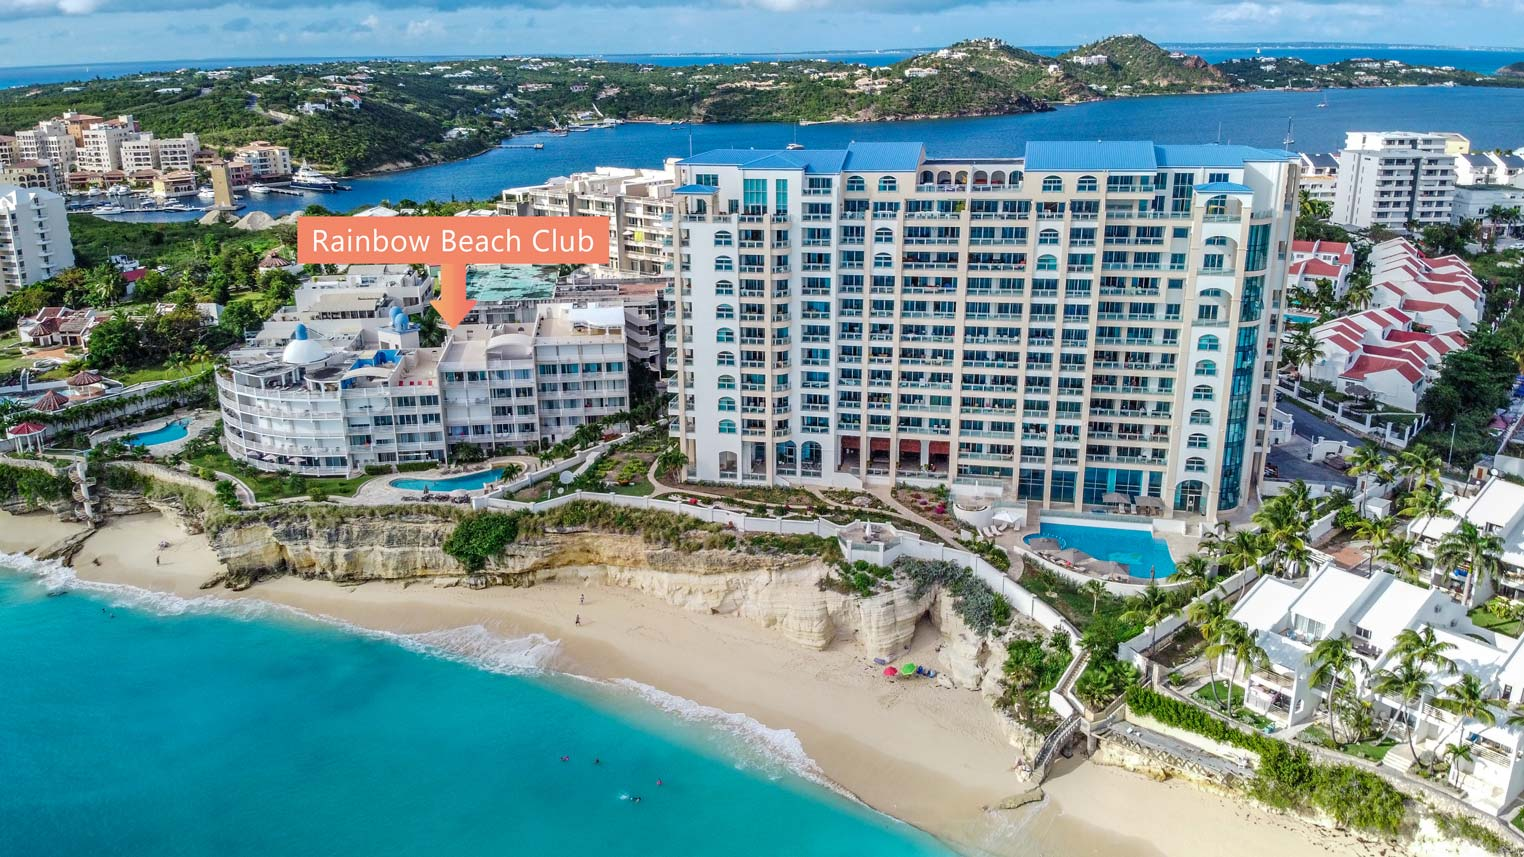 Rainbow Beach Club Condos For Rent